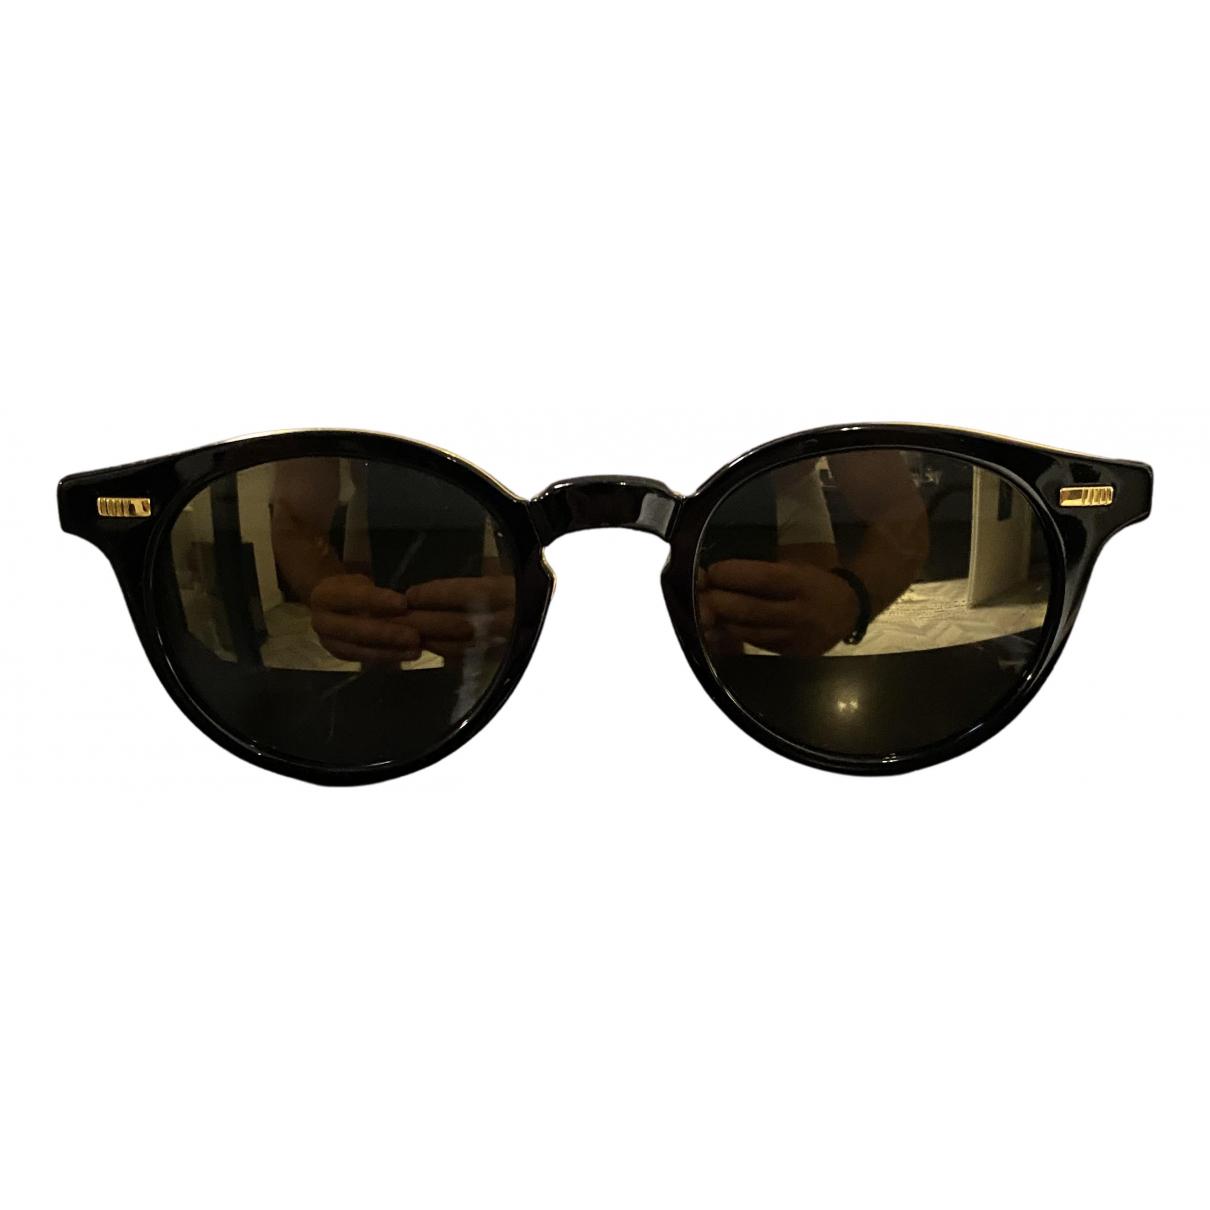 Thom Browne N Blue Sunglasses for Men N